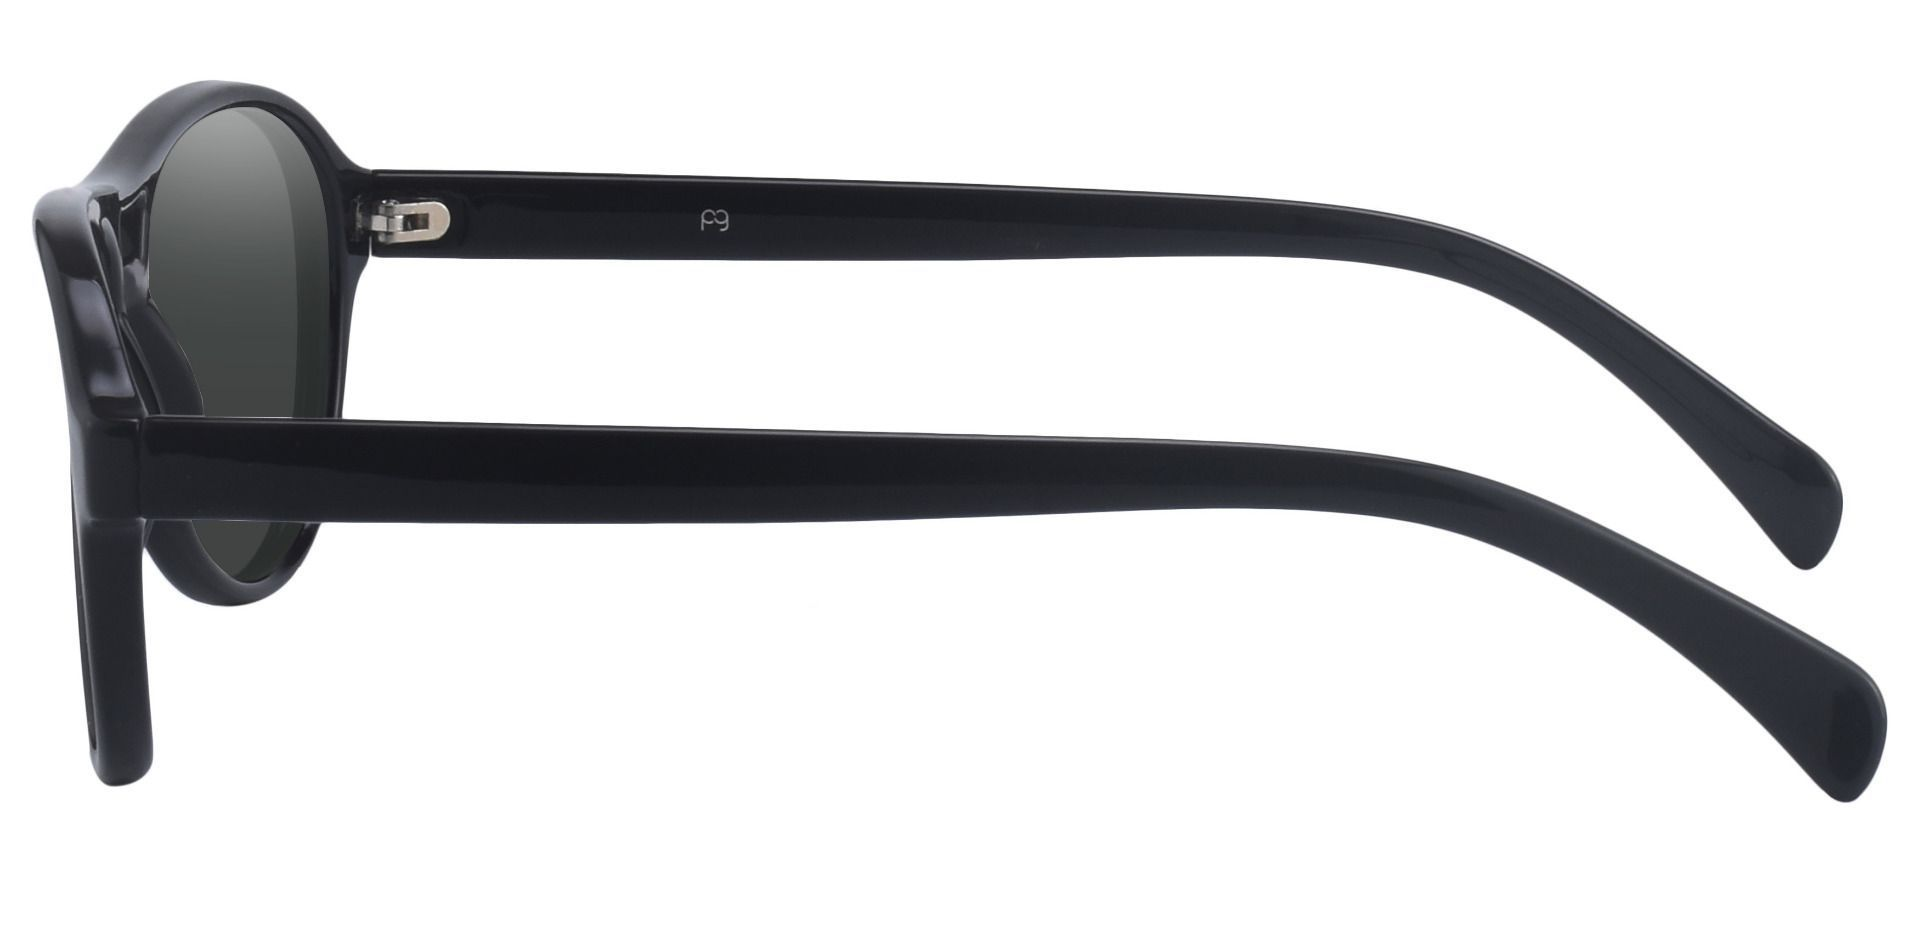 Sosa Aviator Prescription Sunglasses - Black Frame With Gray Lenses